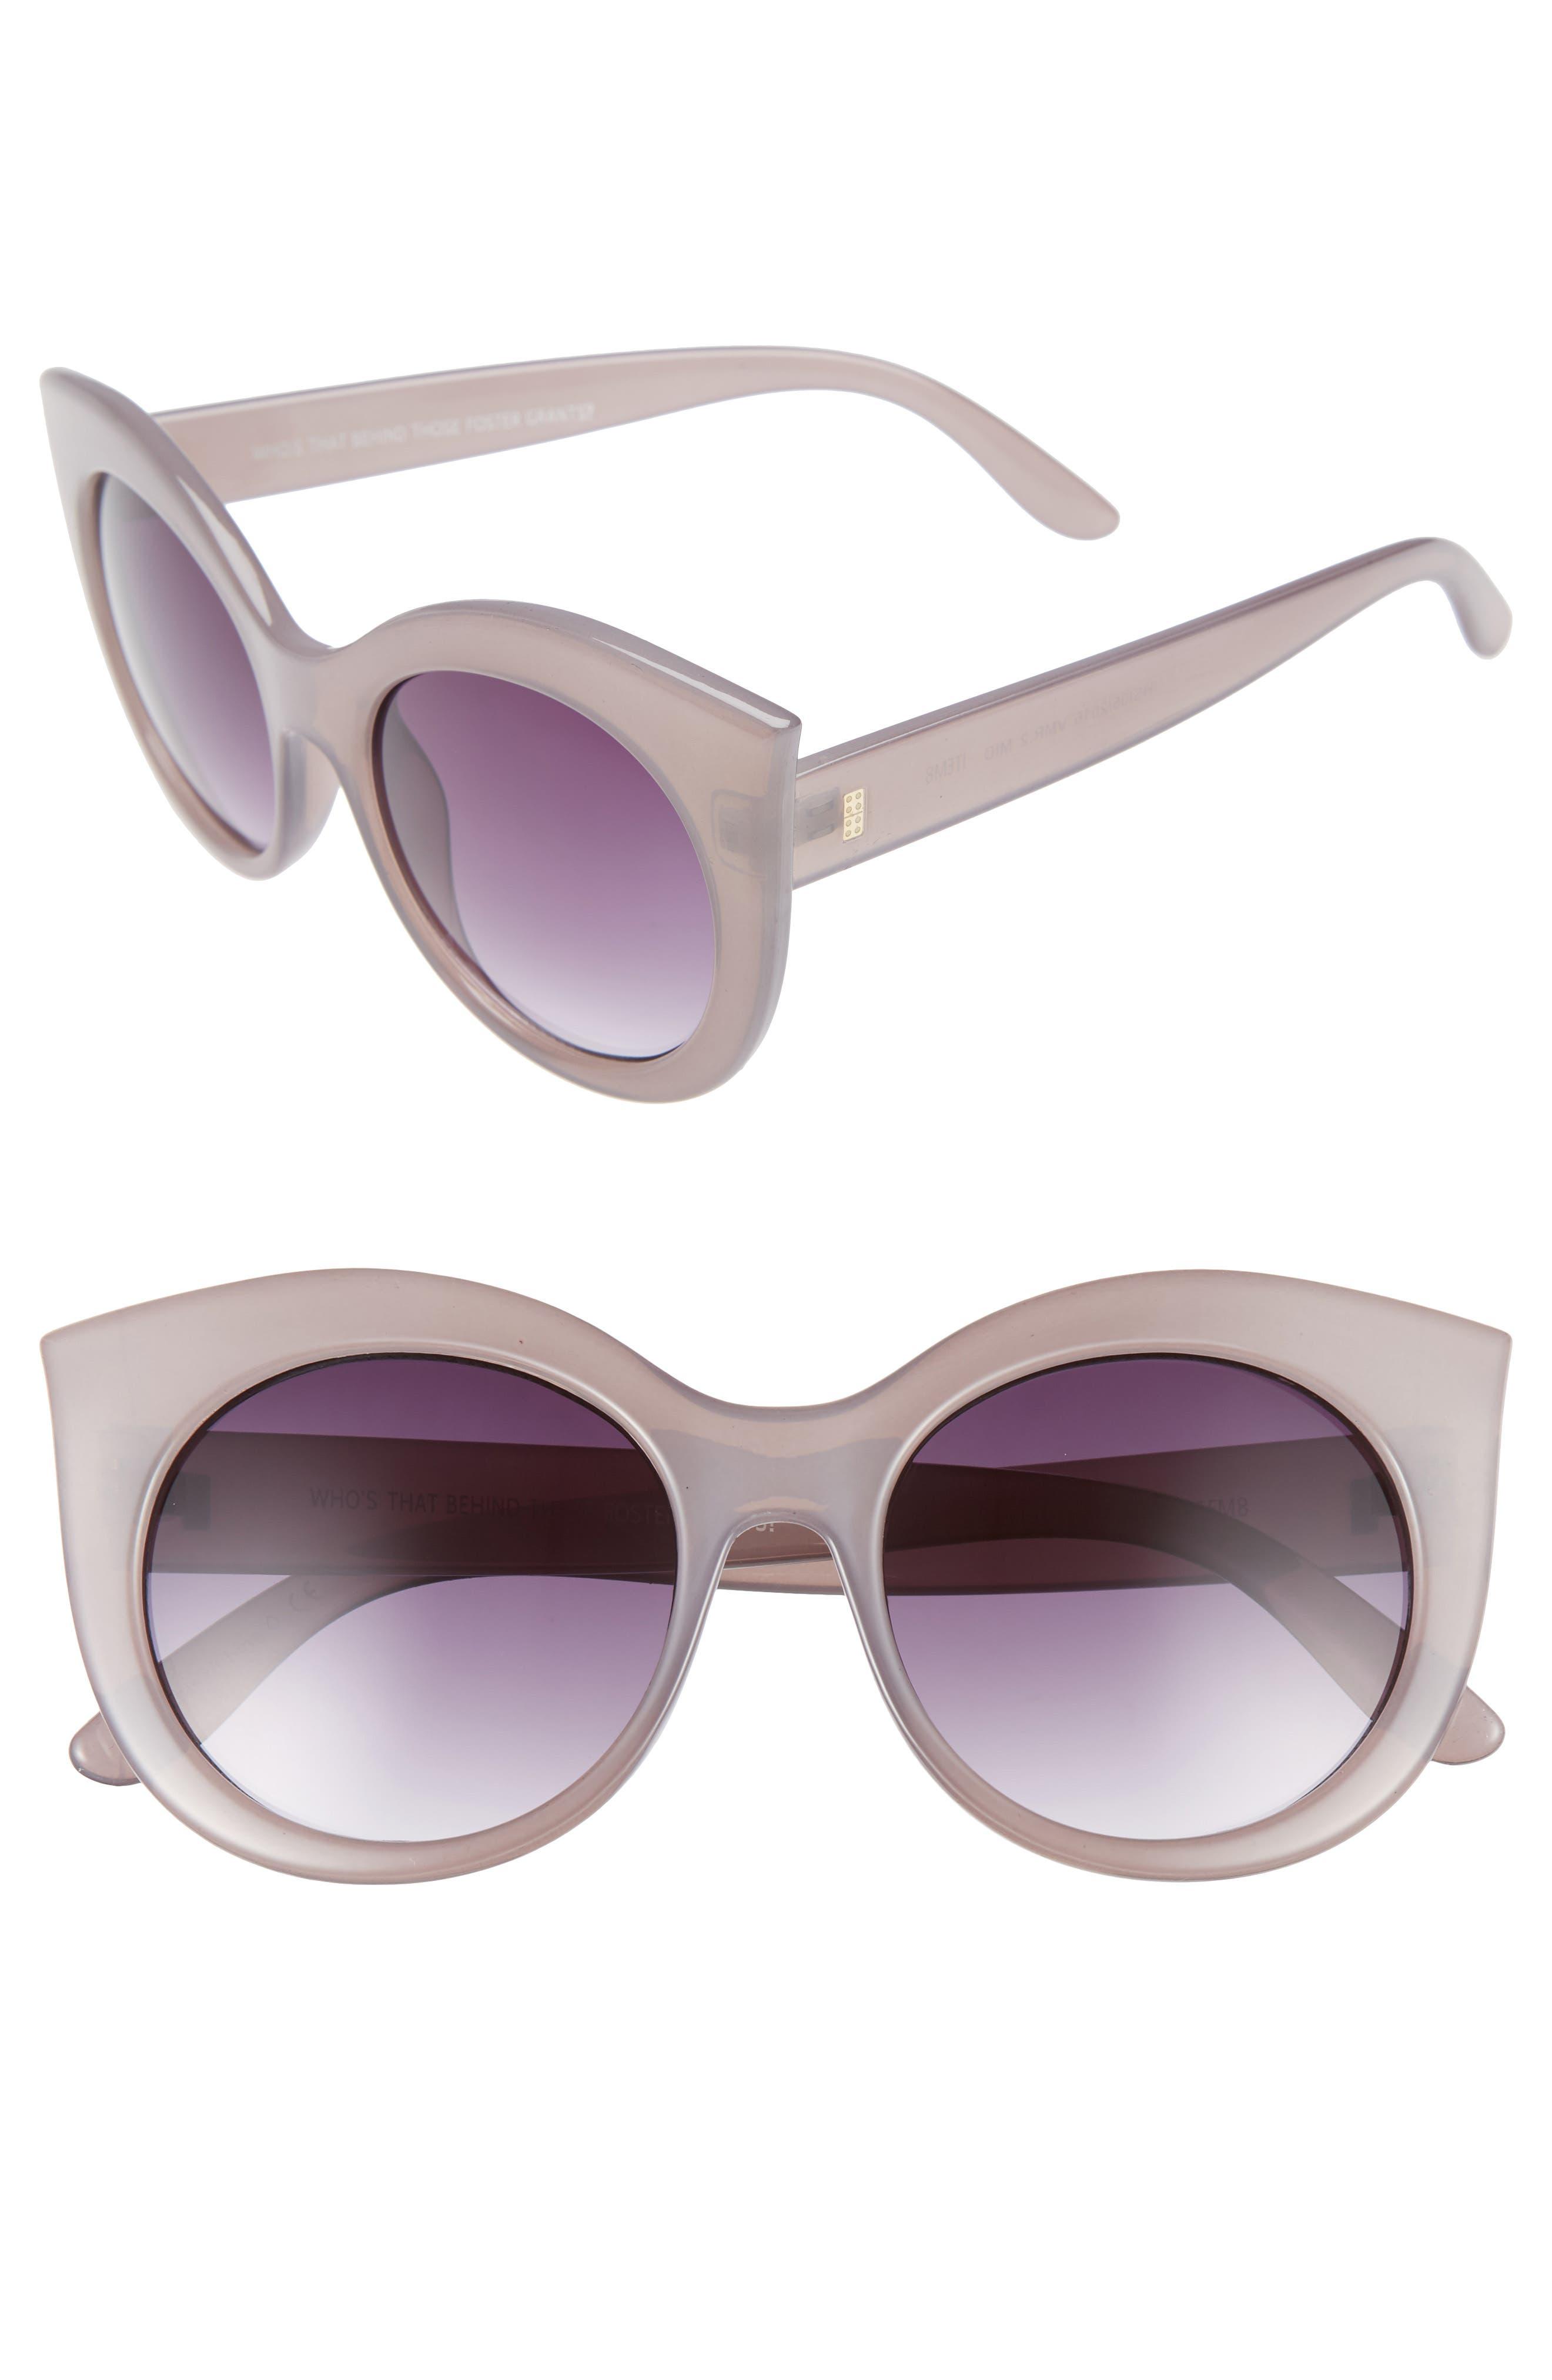 ITEM 8 VMR.2 57mm Sunglasses